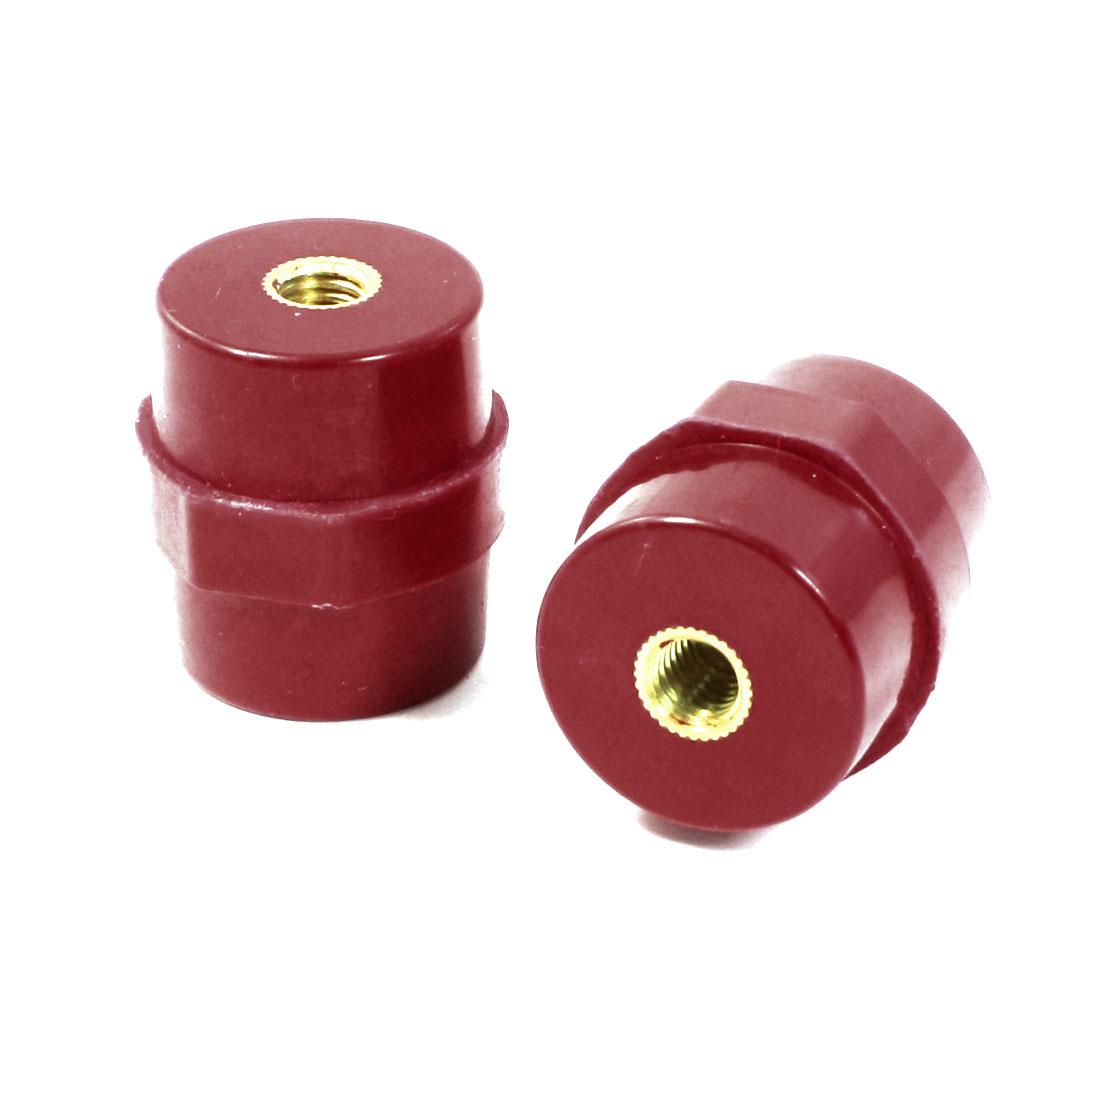 "0.27"" Brass Thread Red Busbar Support Enhanced Insulator Connector"